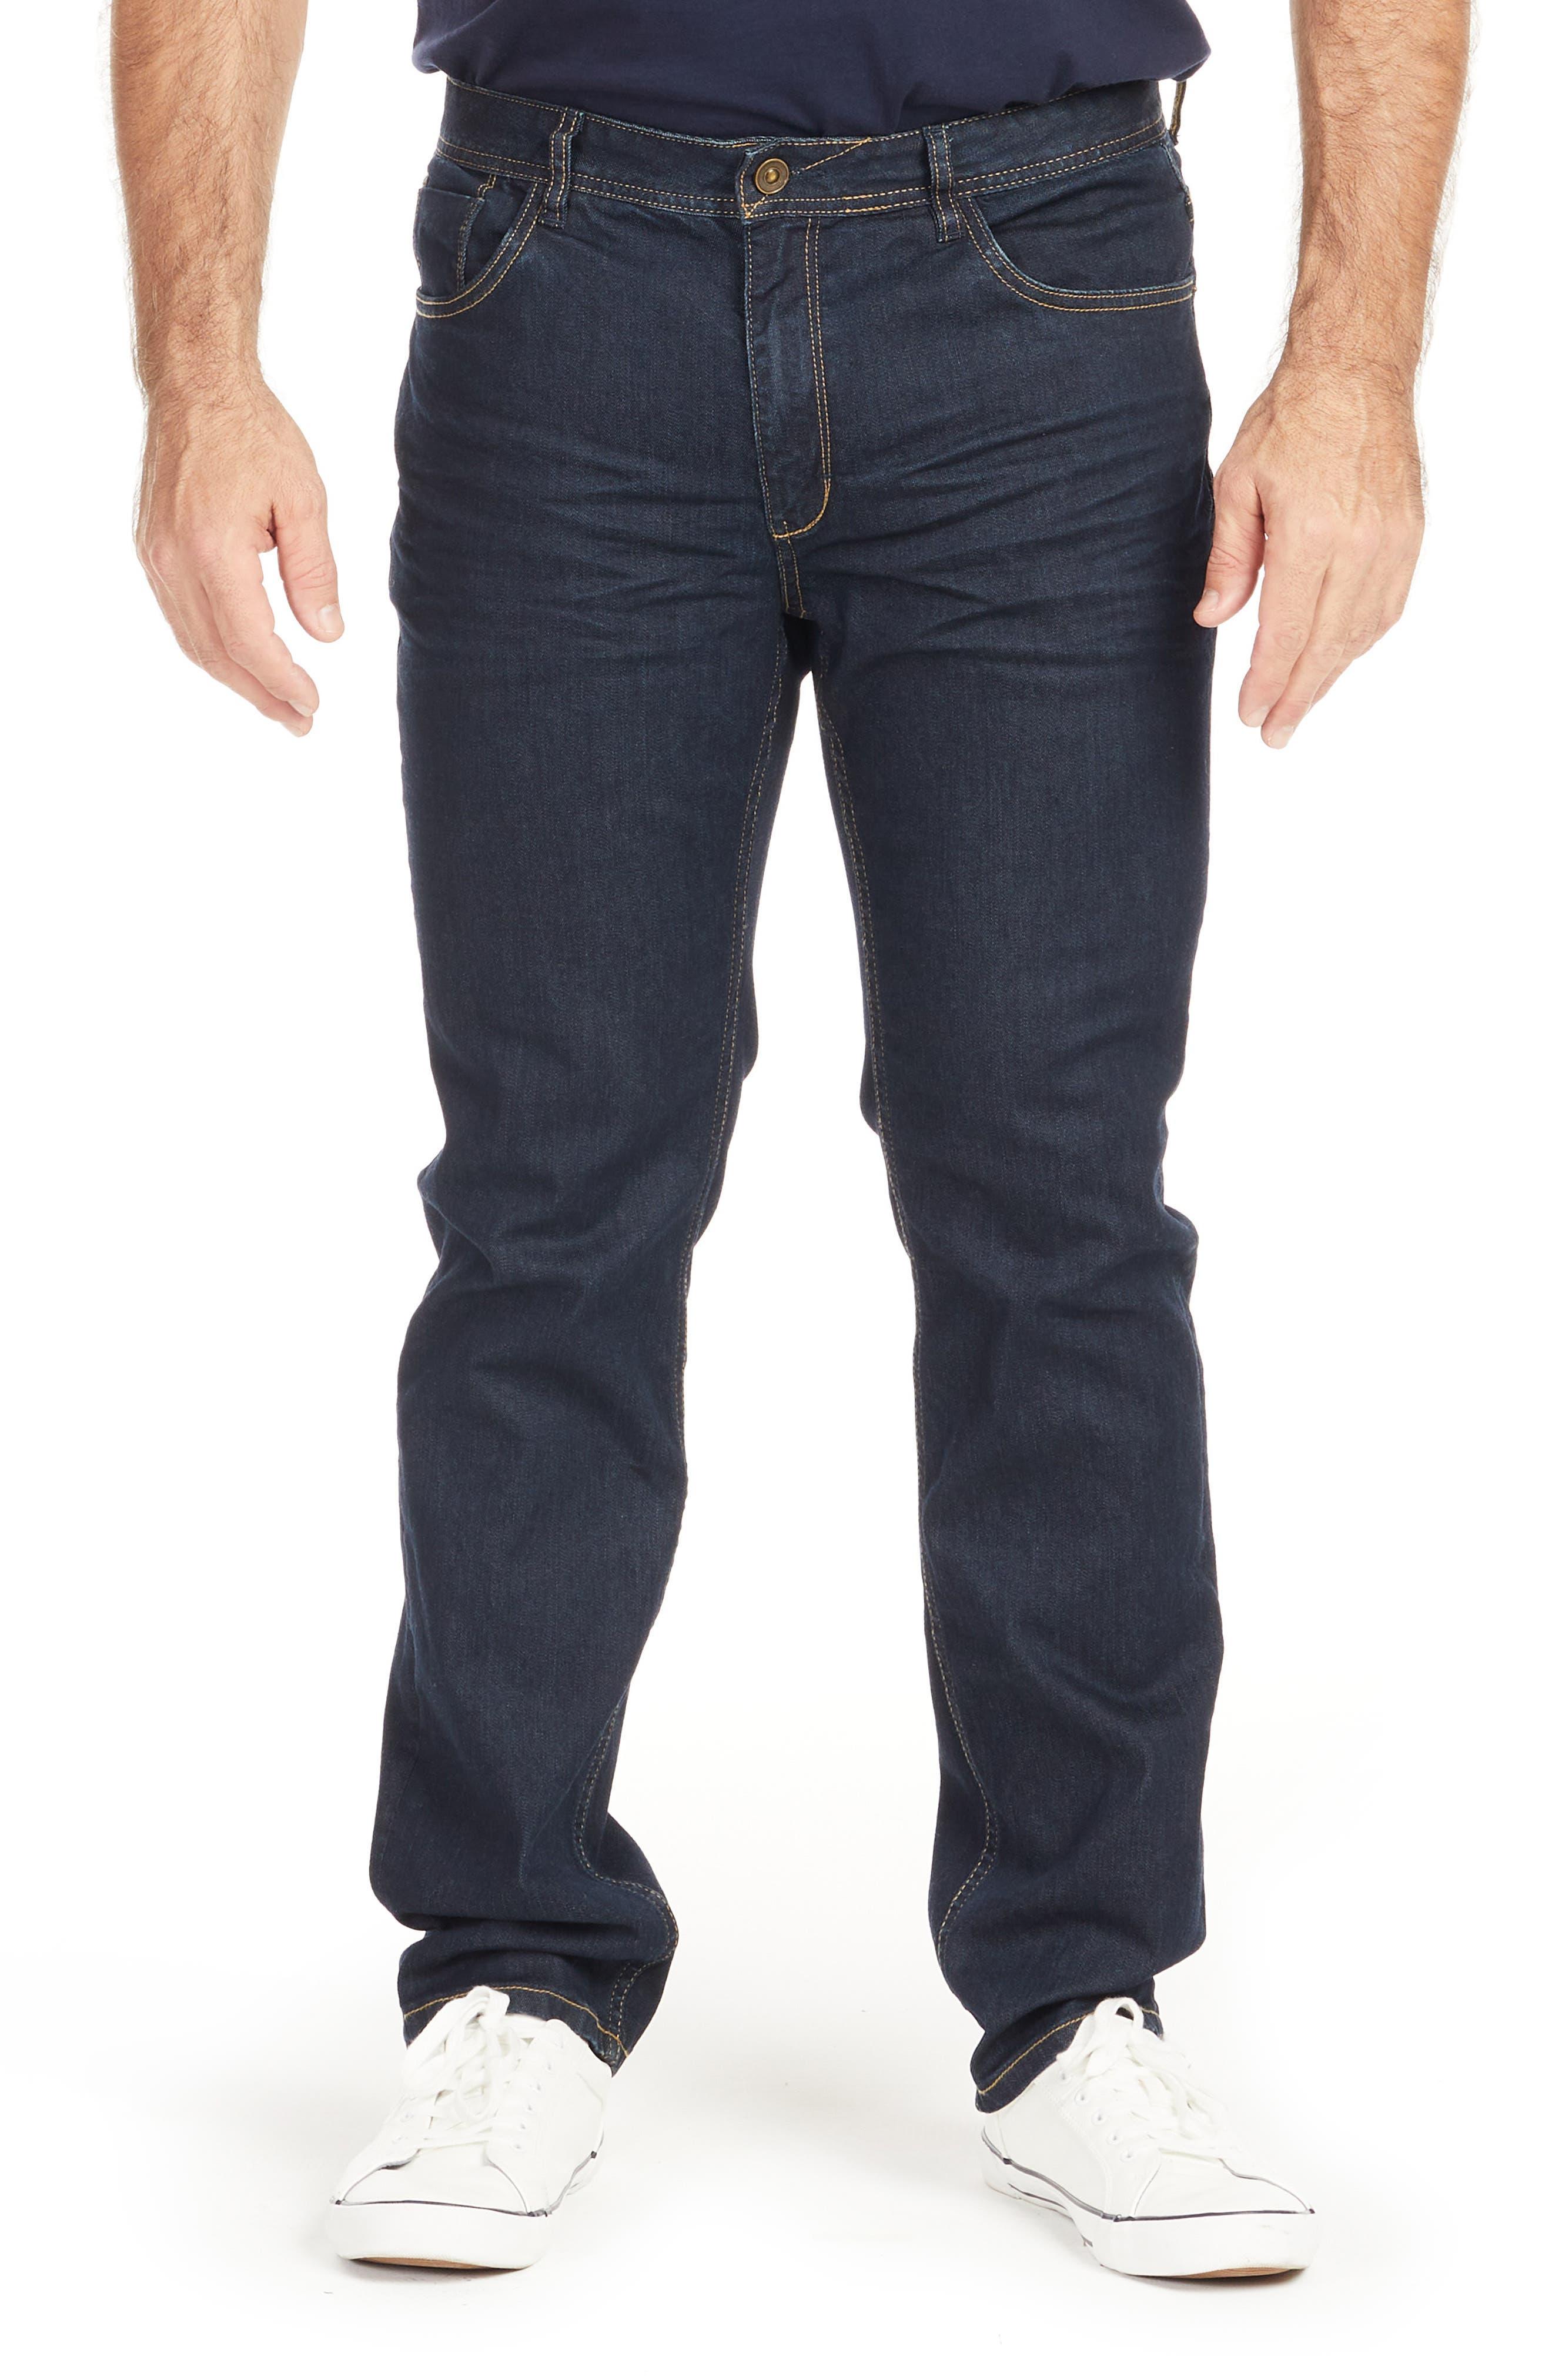 Easton Raw Slim Fit Jeans